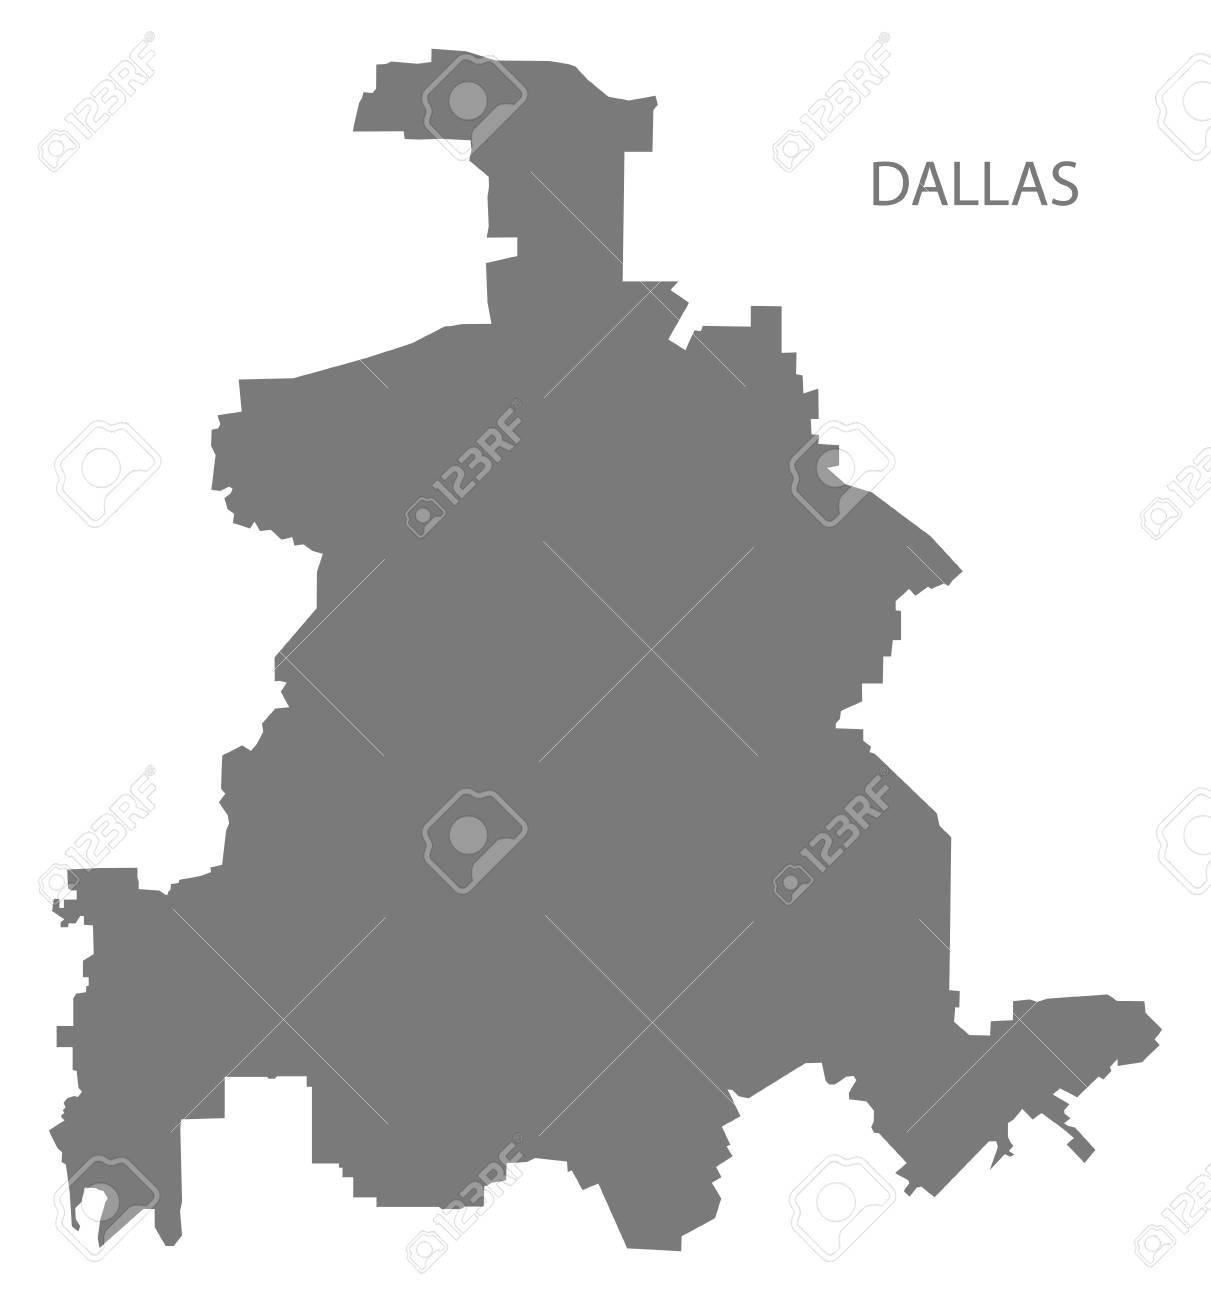 Map Of Texas City.Dallas Texas City Map Grey Illustration Silhouette Shape